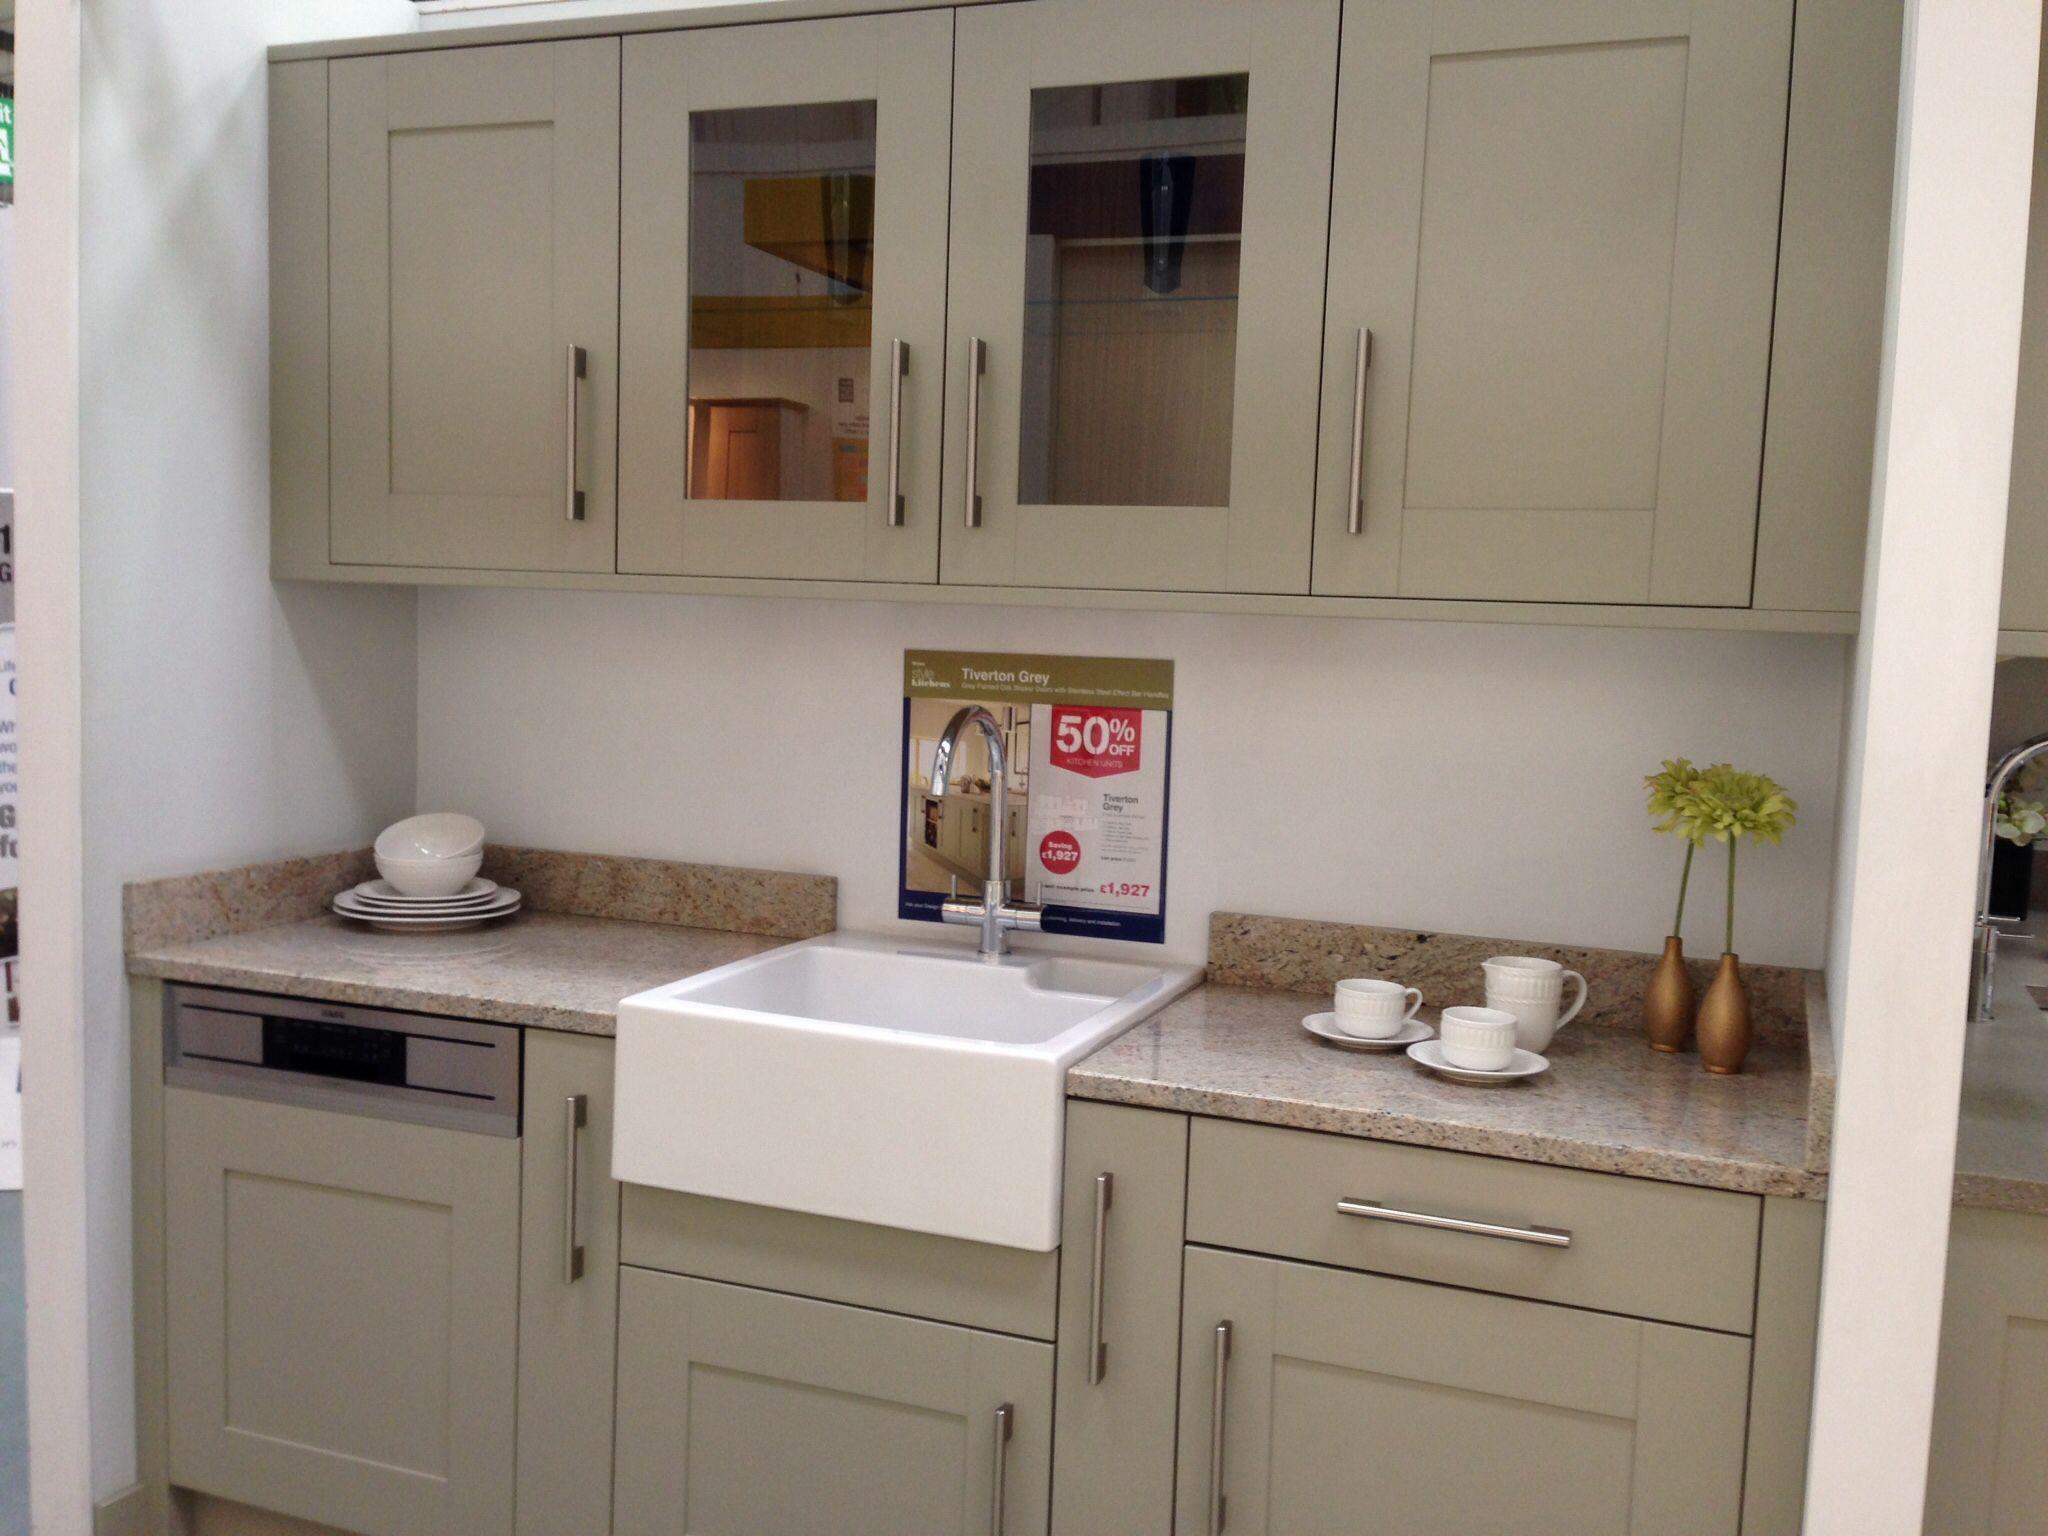 Kitchen units Wickes. Tiverton Grey Kitchen